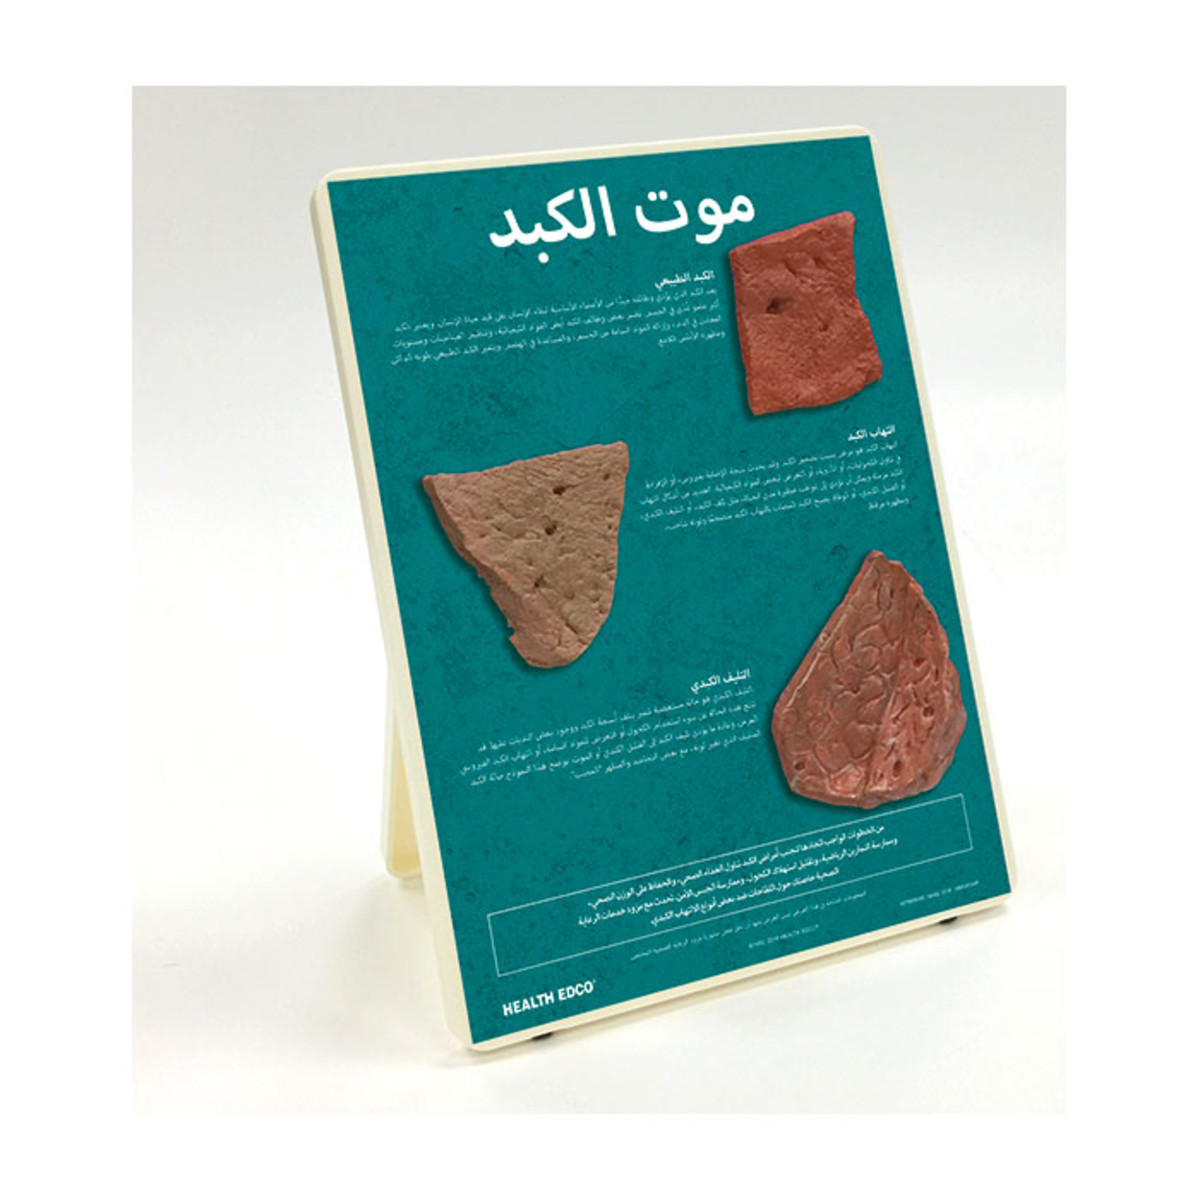 Health Edco; Arabic; health education products; liver disease; hepatitis; cirrhotic liver; alcohol abuse